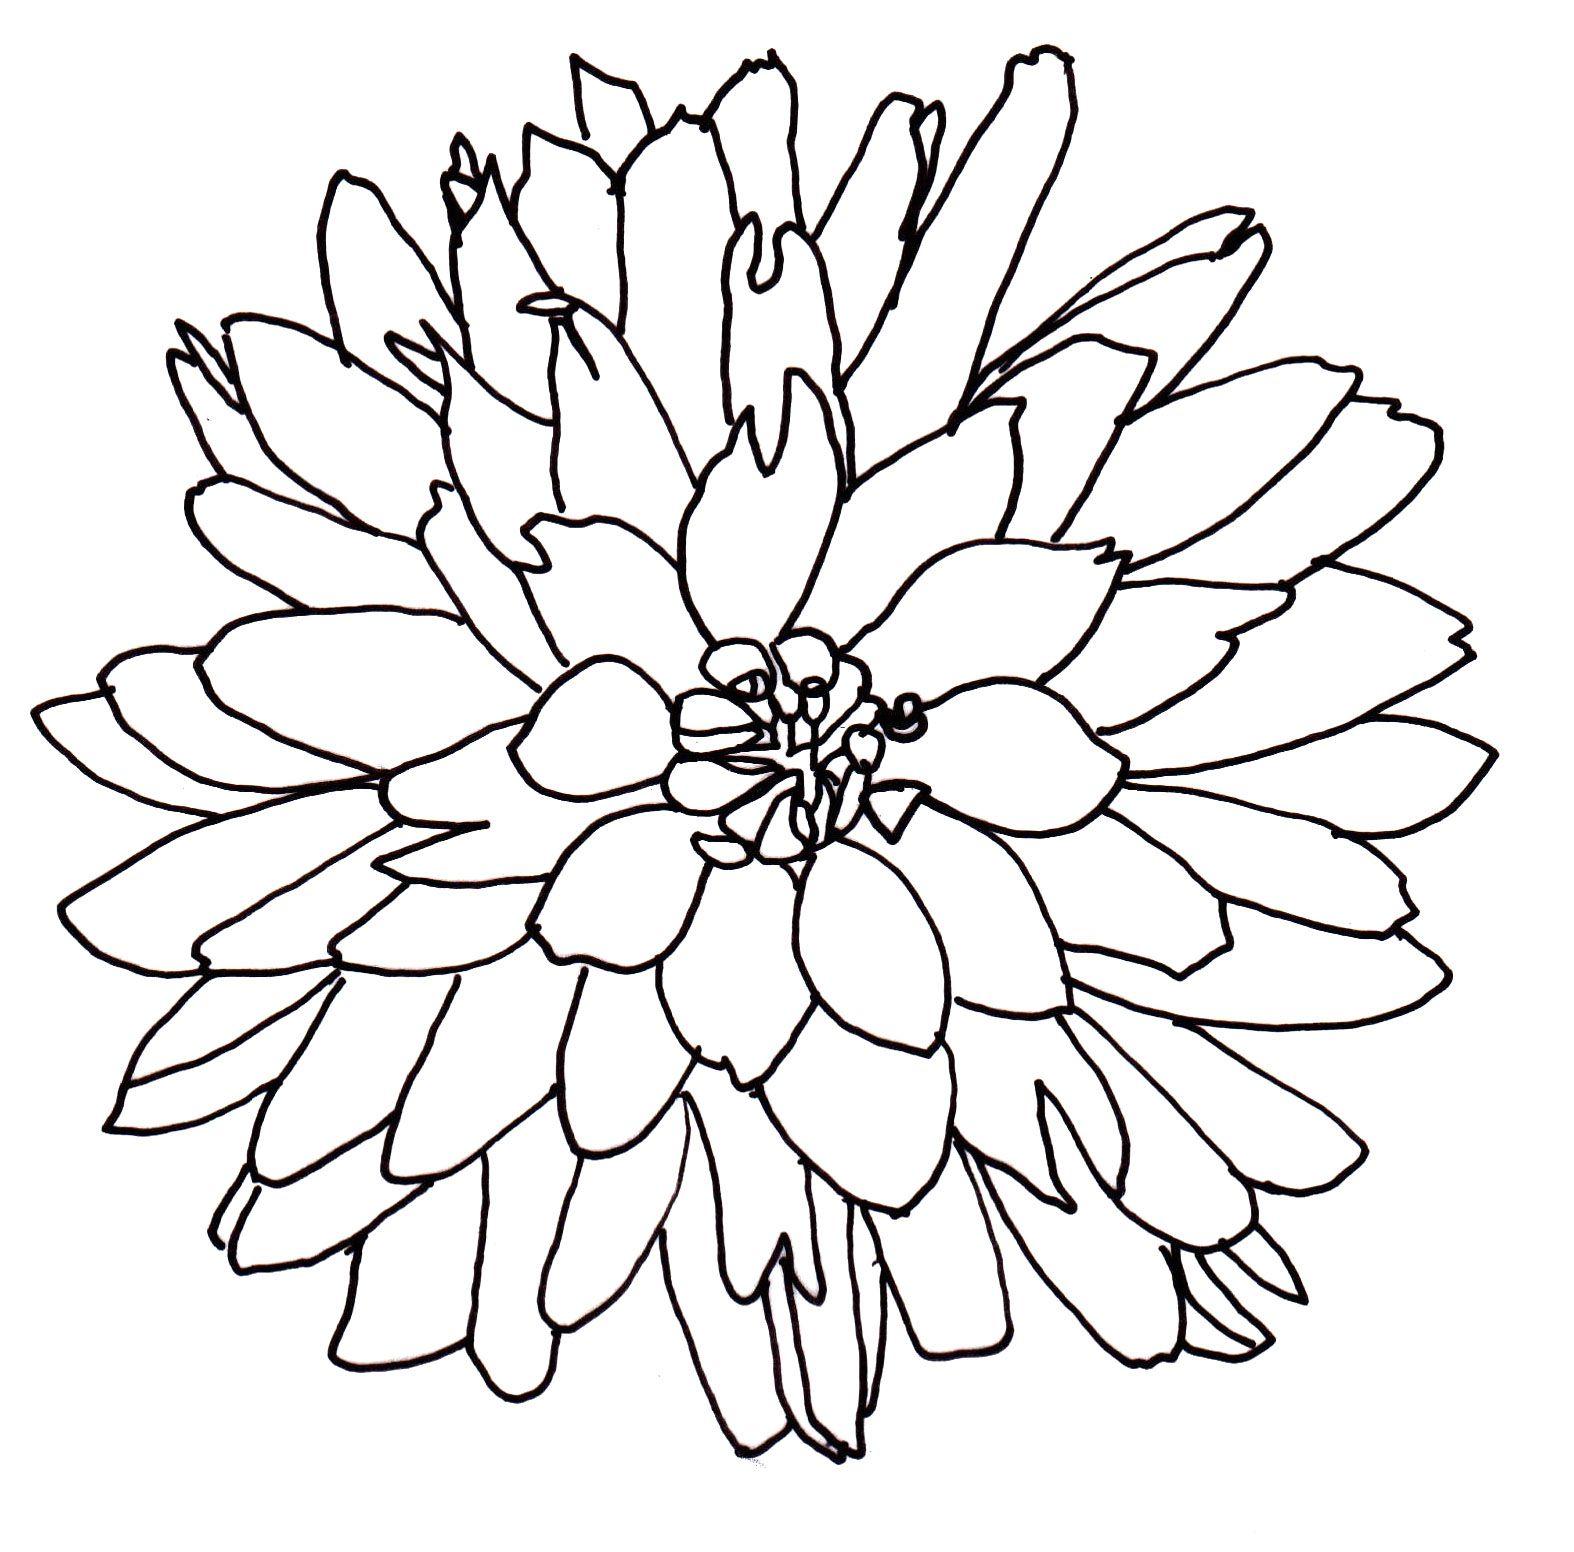 Line Drawing Flowers Dahlia Flower Line Drawings Flower